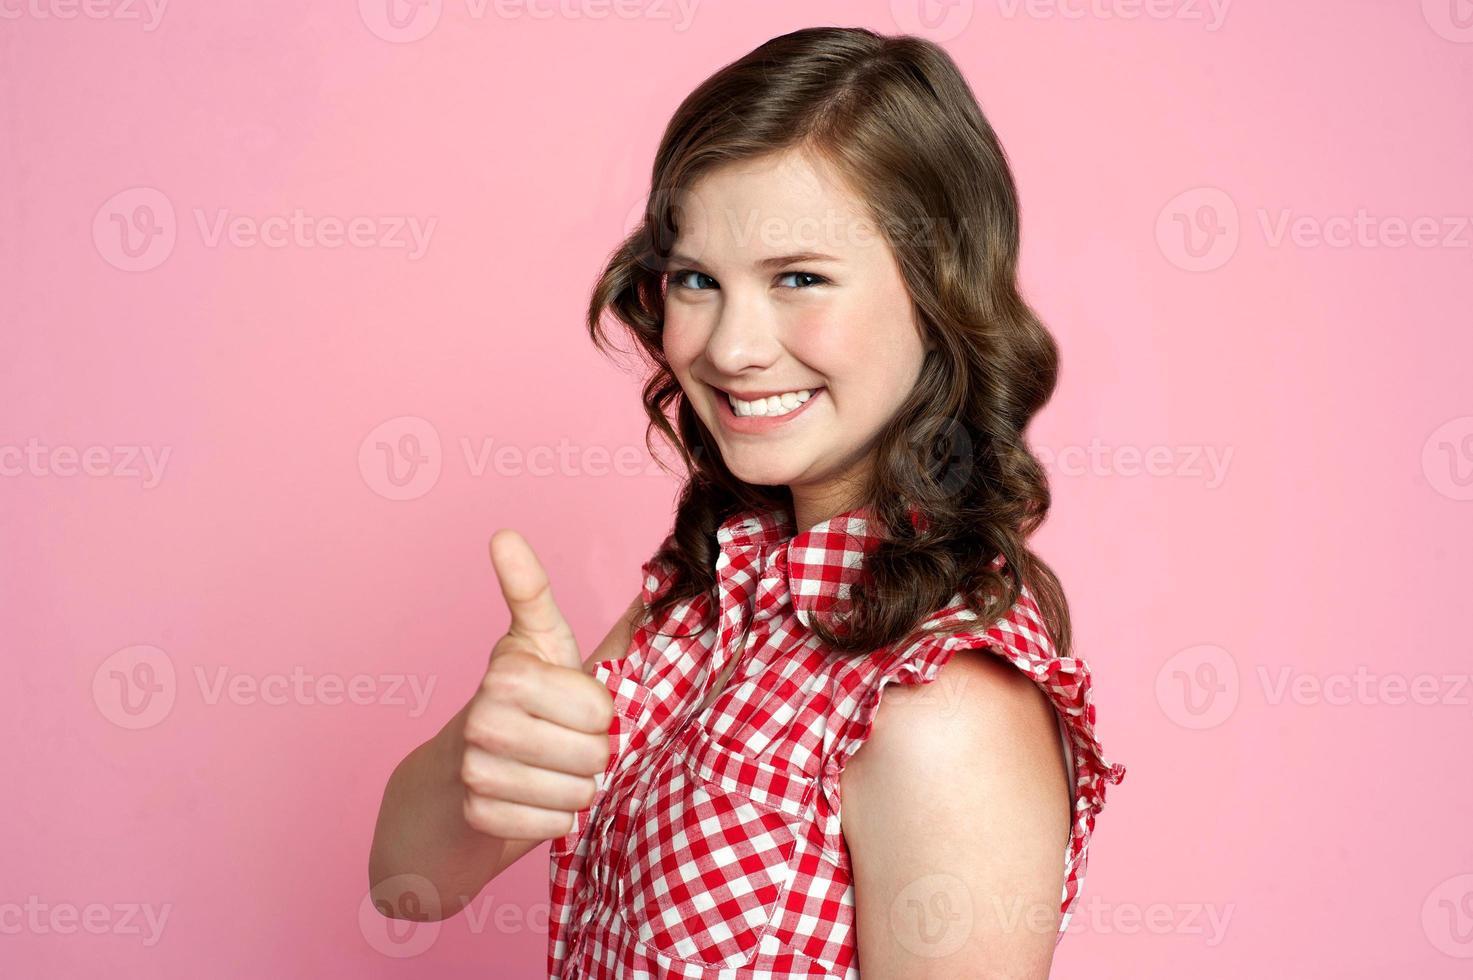 linda garota sorridente com gesto bem foto